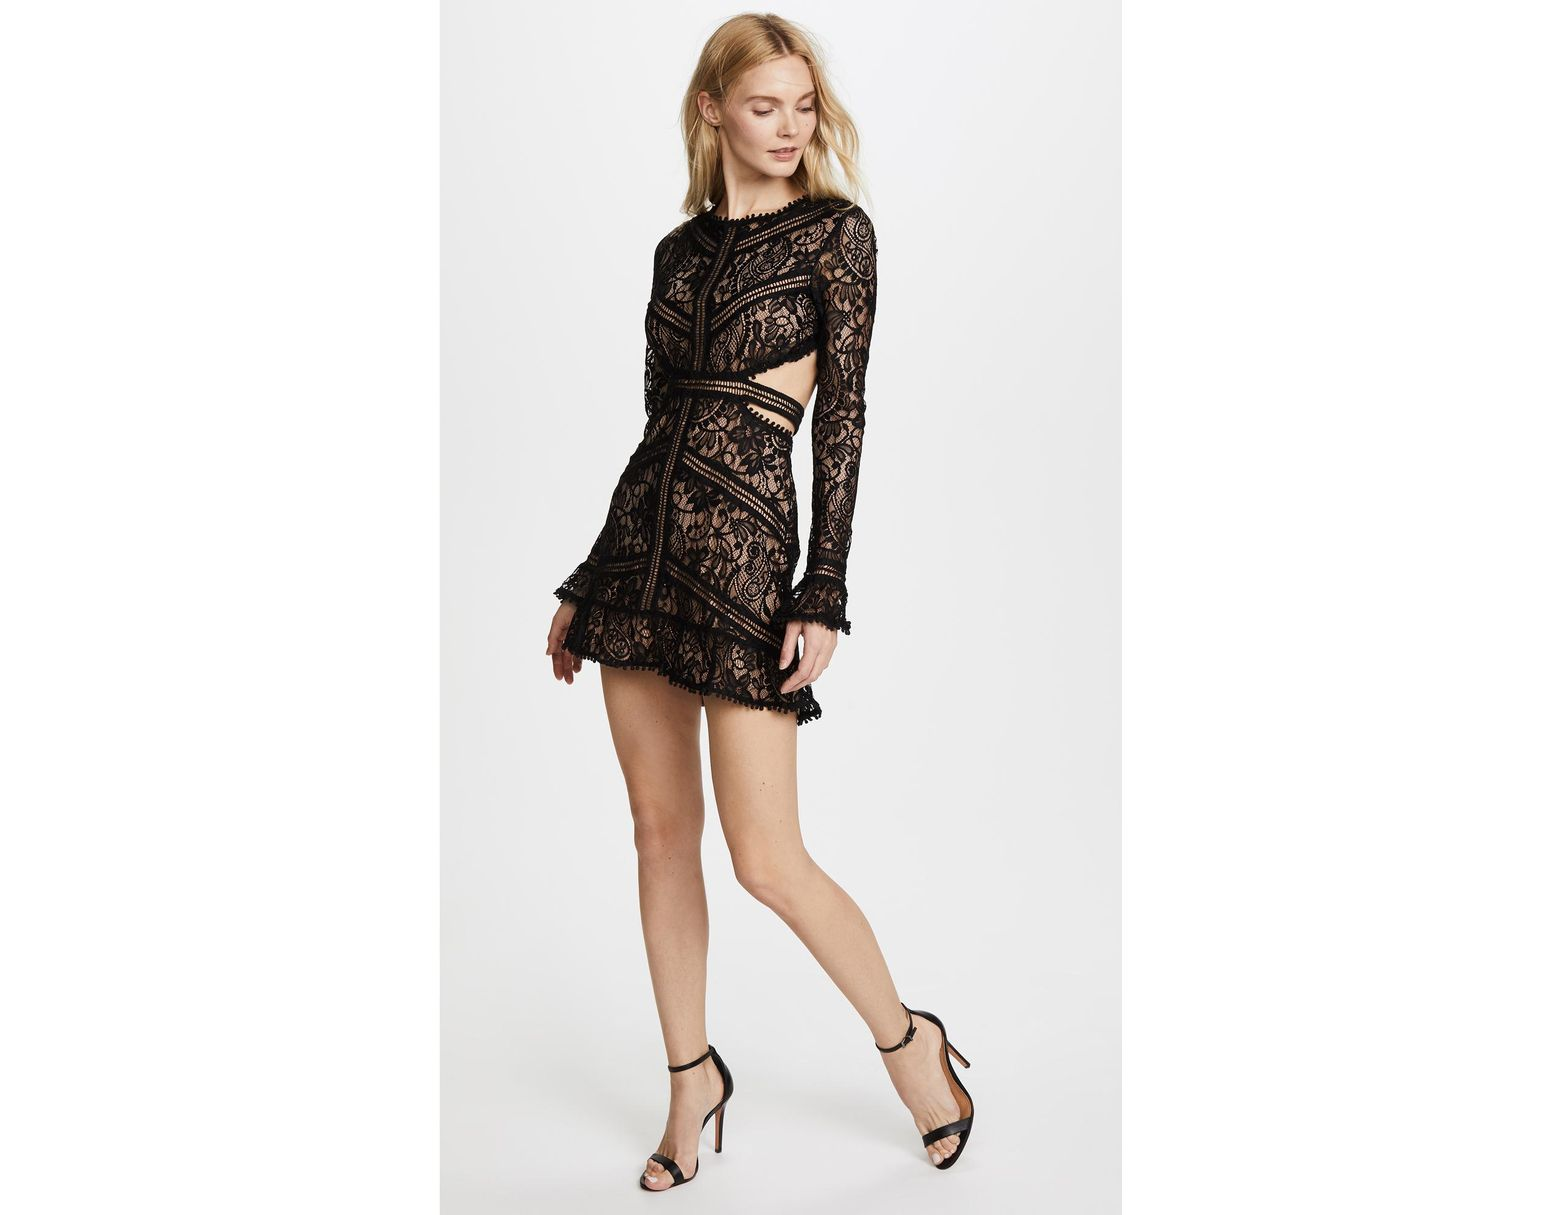 19ce7f1c5b5ee For Love & Lemons Emerie Cutout Dress in Black - Lyst